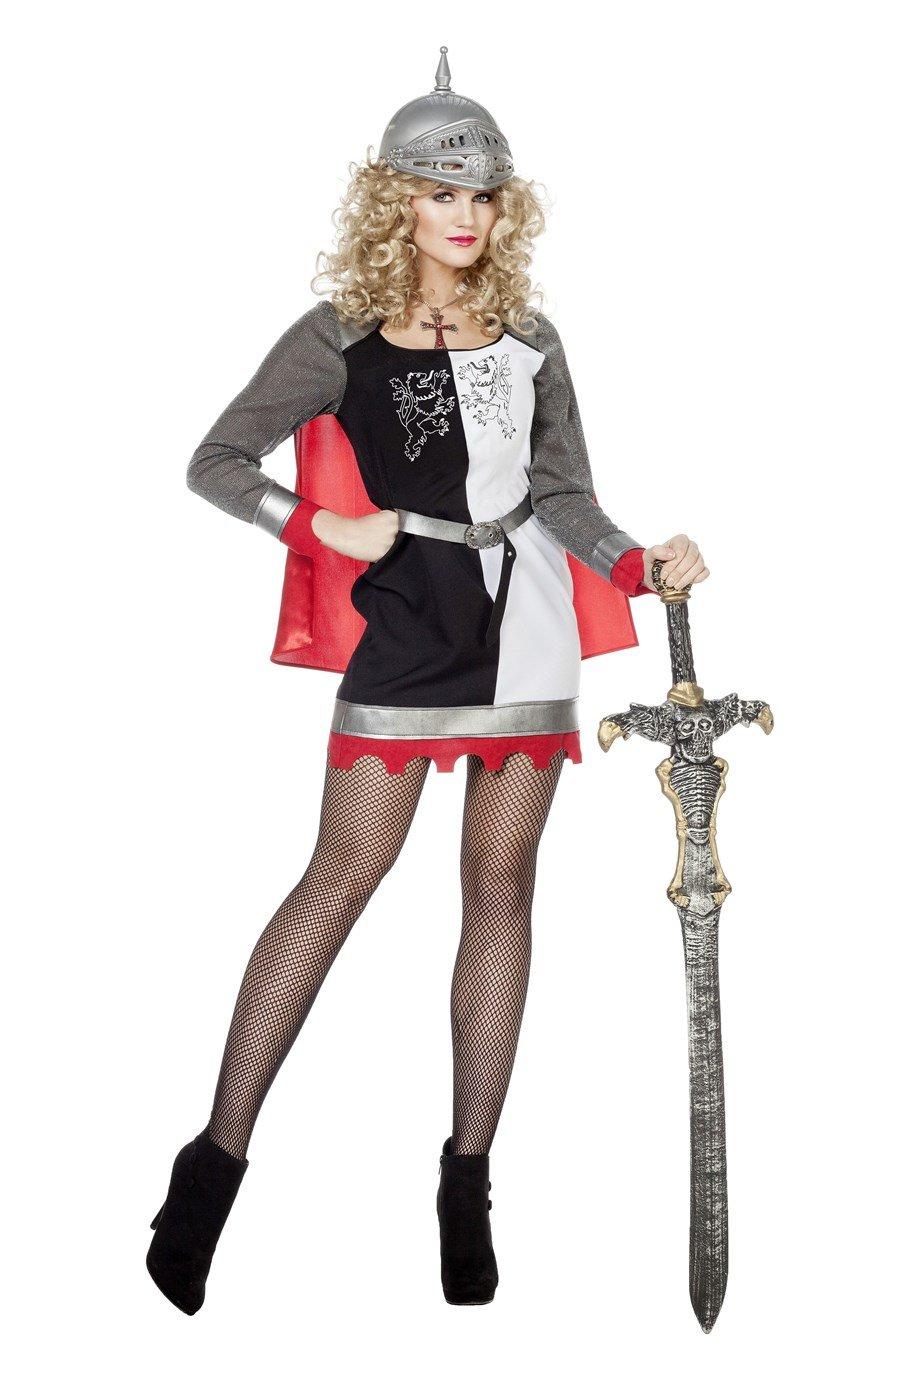 The Fantasy Tailor Tailor Tailor Ritter Kostüm Damen Mittelalter Grau Rot Hose, Oberteil und Kapuze Rollenspiel Cosplay Mittelalter-Tracht Karneval Fasching Hochertiges Kostüm Größe 42 Rot 9b0985